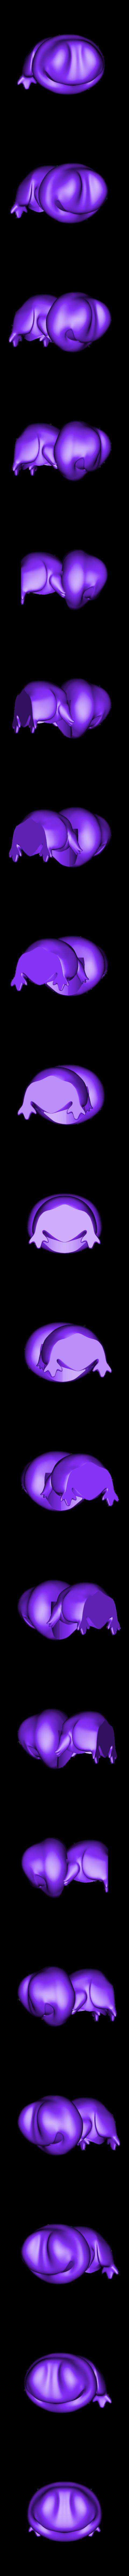 TravelFrogH60mmA.stl Download free STL file Travel Frog • 3D printing template, ROYLO